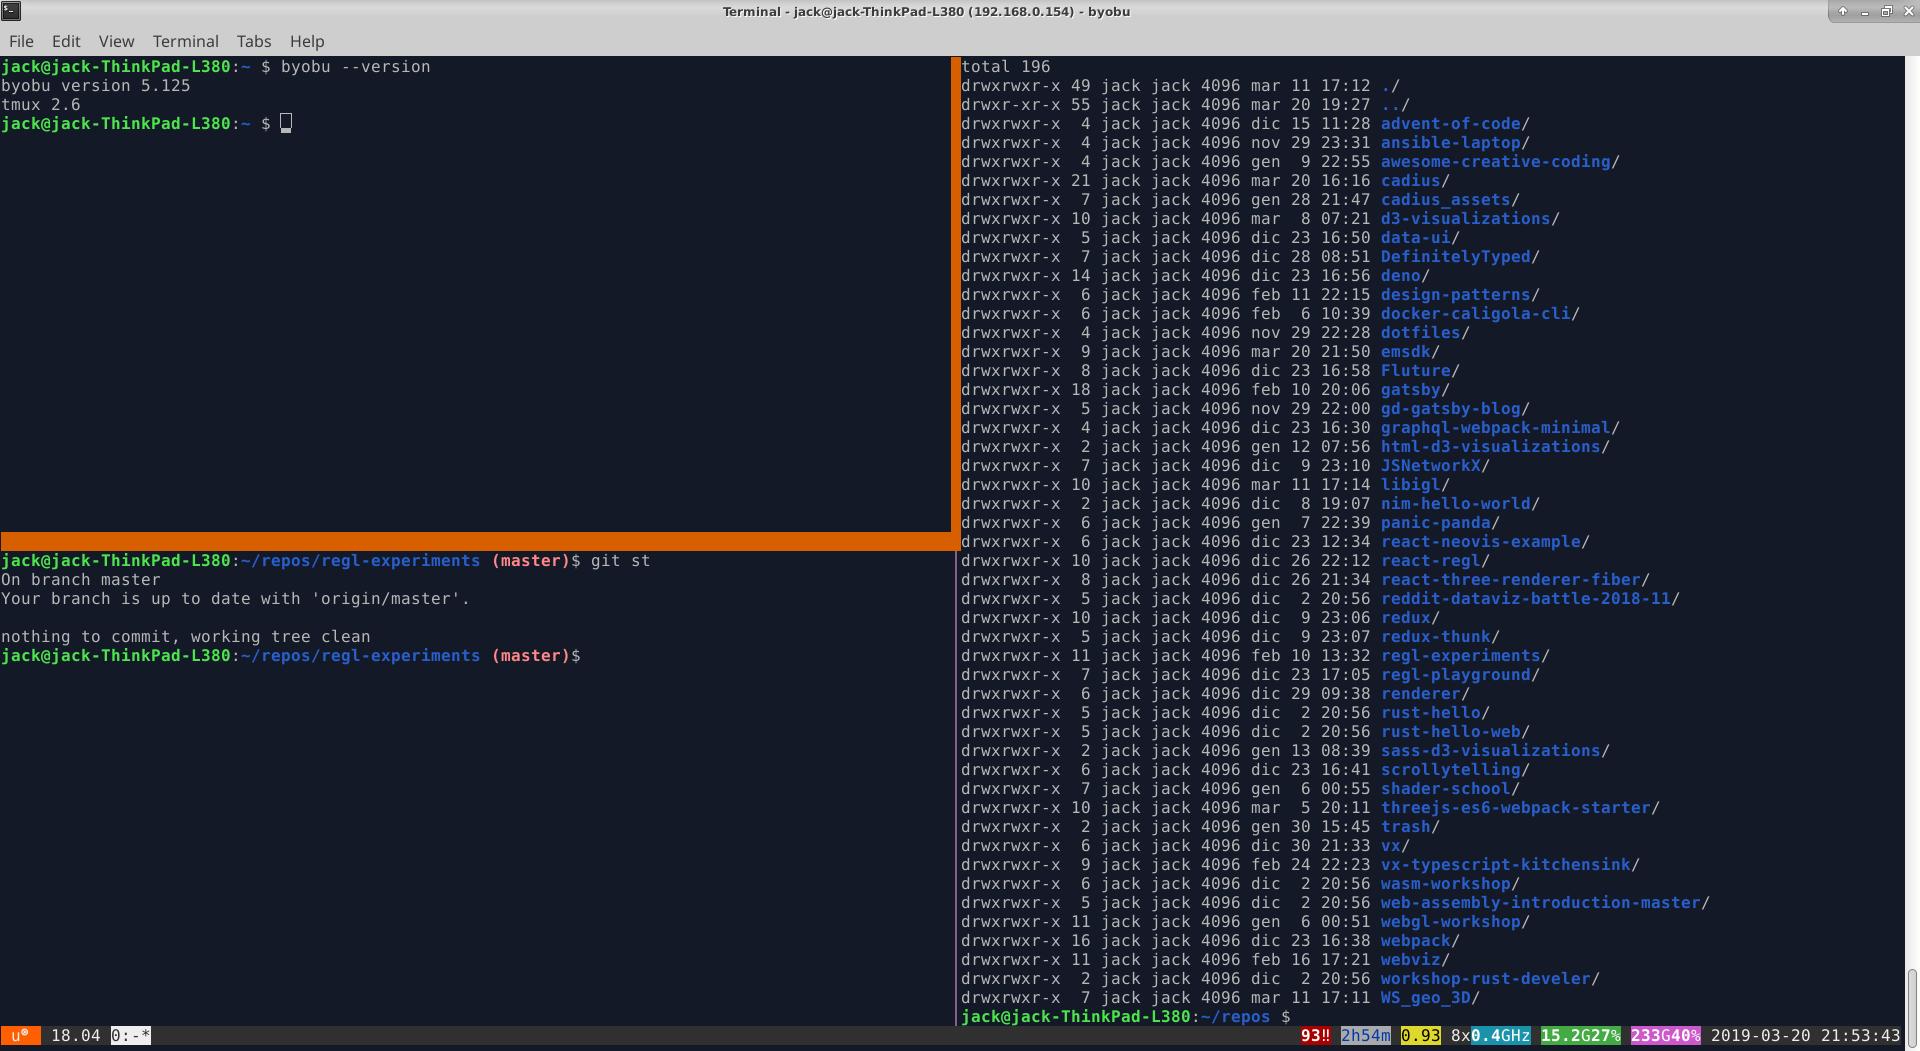 A screenshot of Byobu on my Xubuntu system